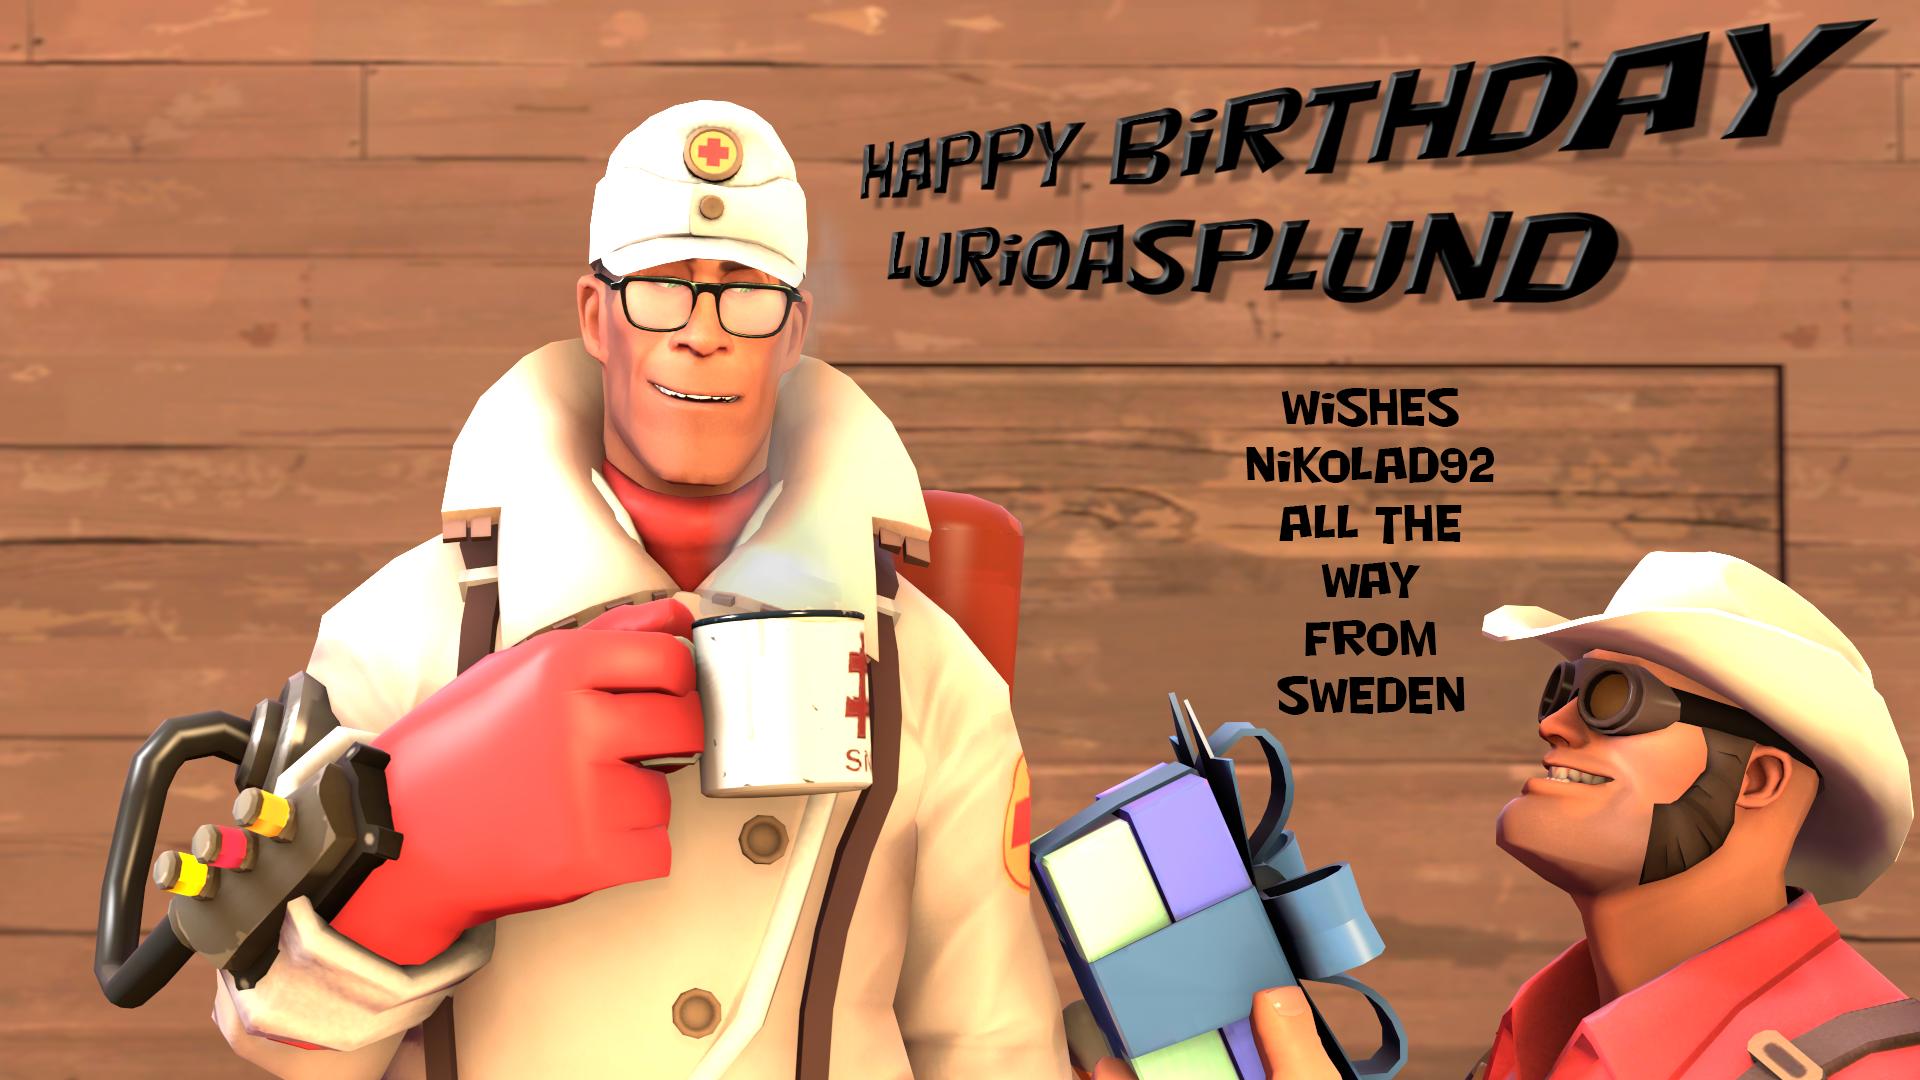 Happy Birthday LurioAsplund by Nikolad92